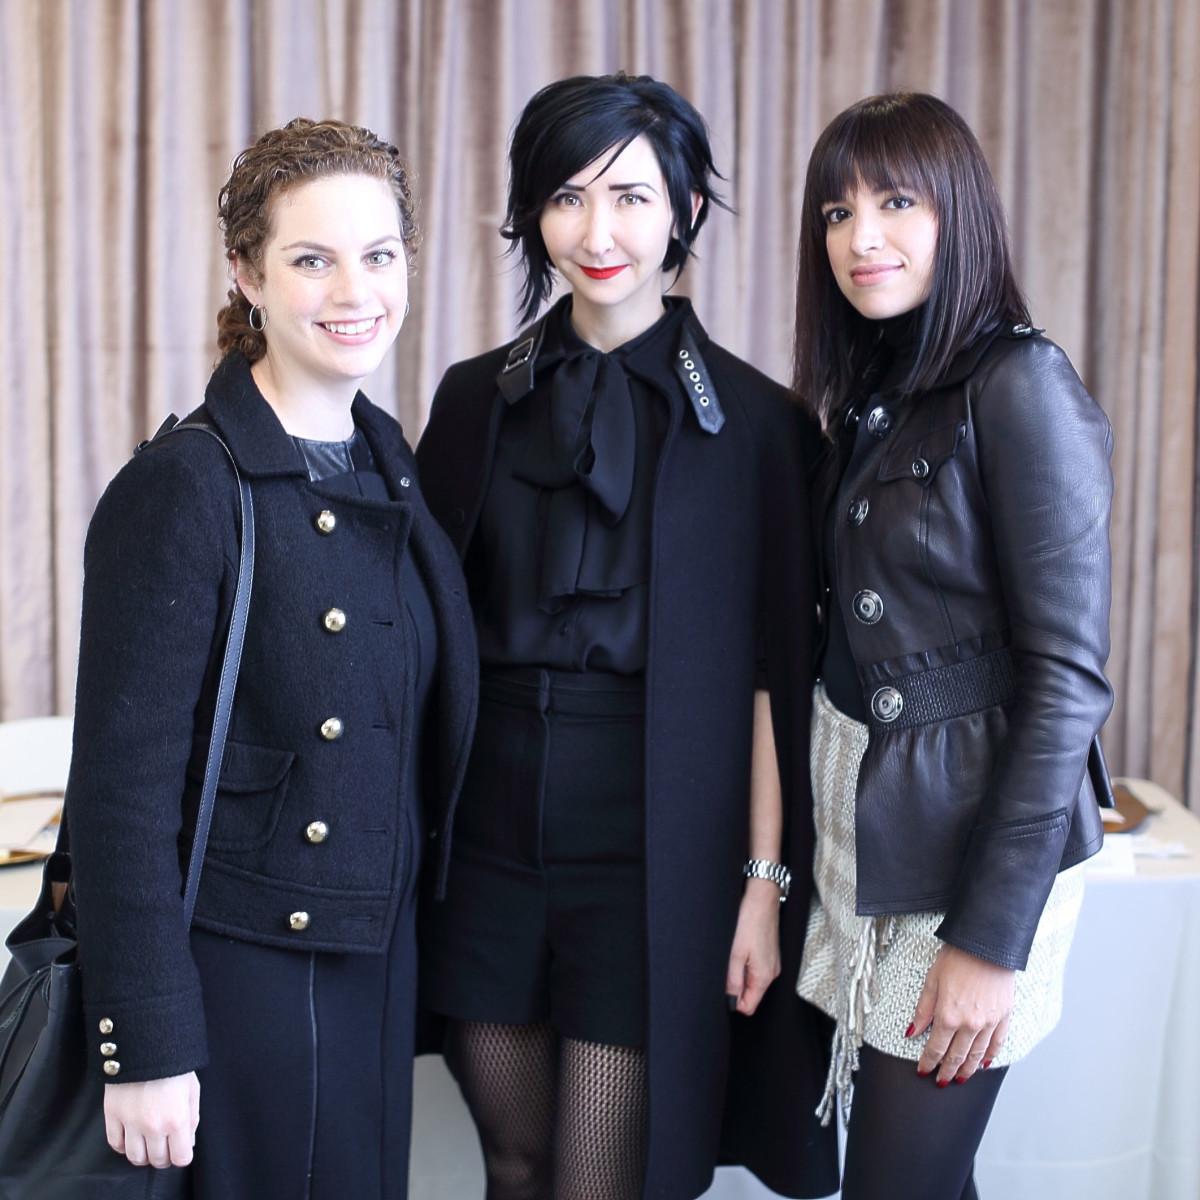 Emily Schreiber, Carrie Brandsberg-Dahl, Sandra Manela at Miles David fashion show